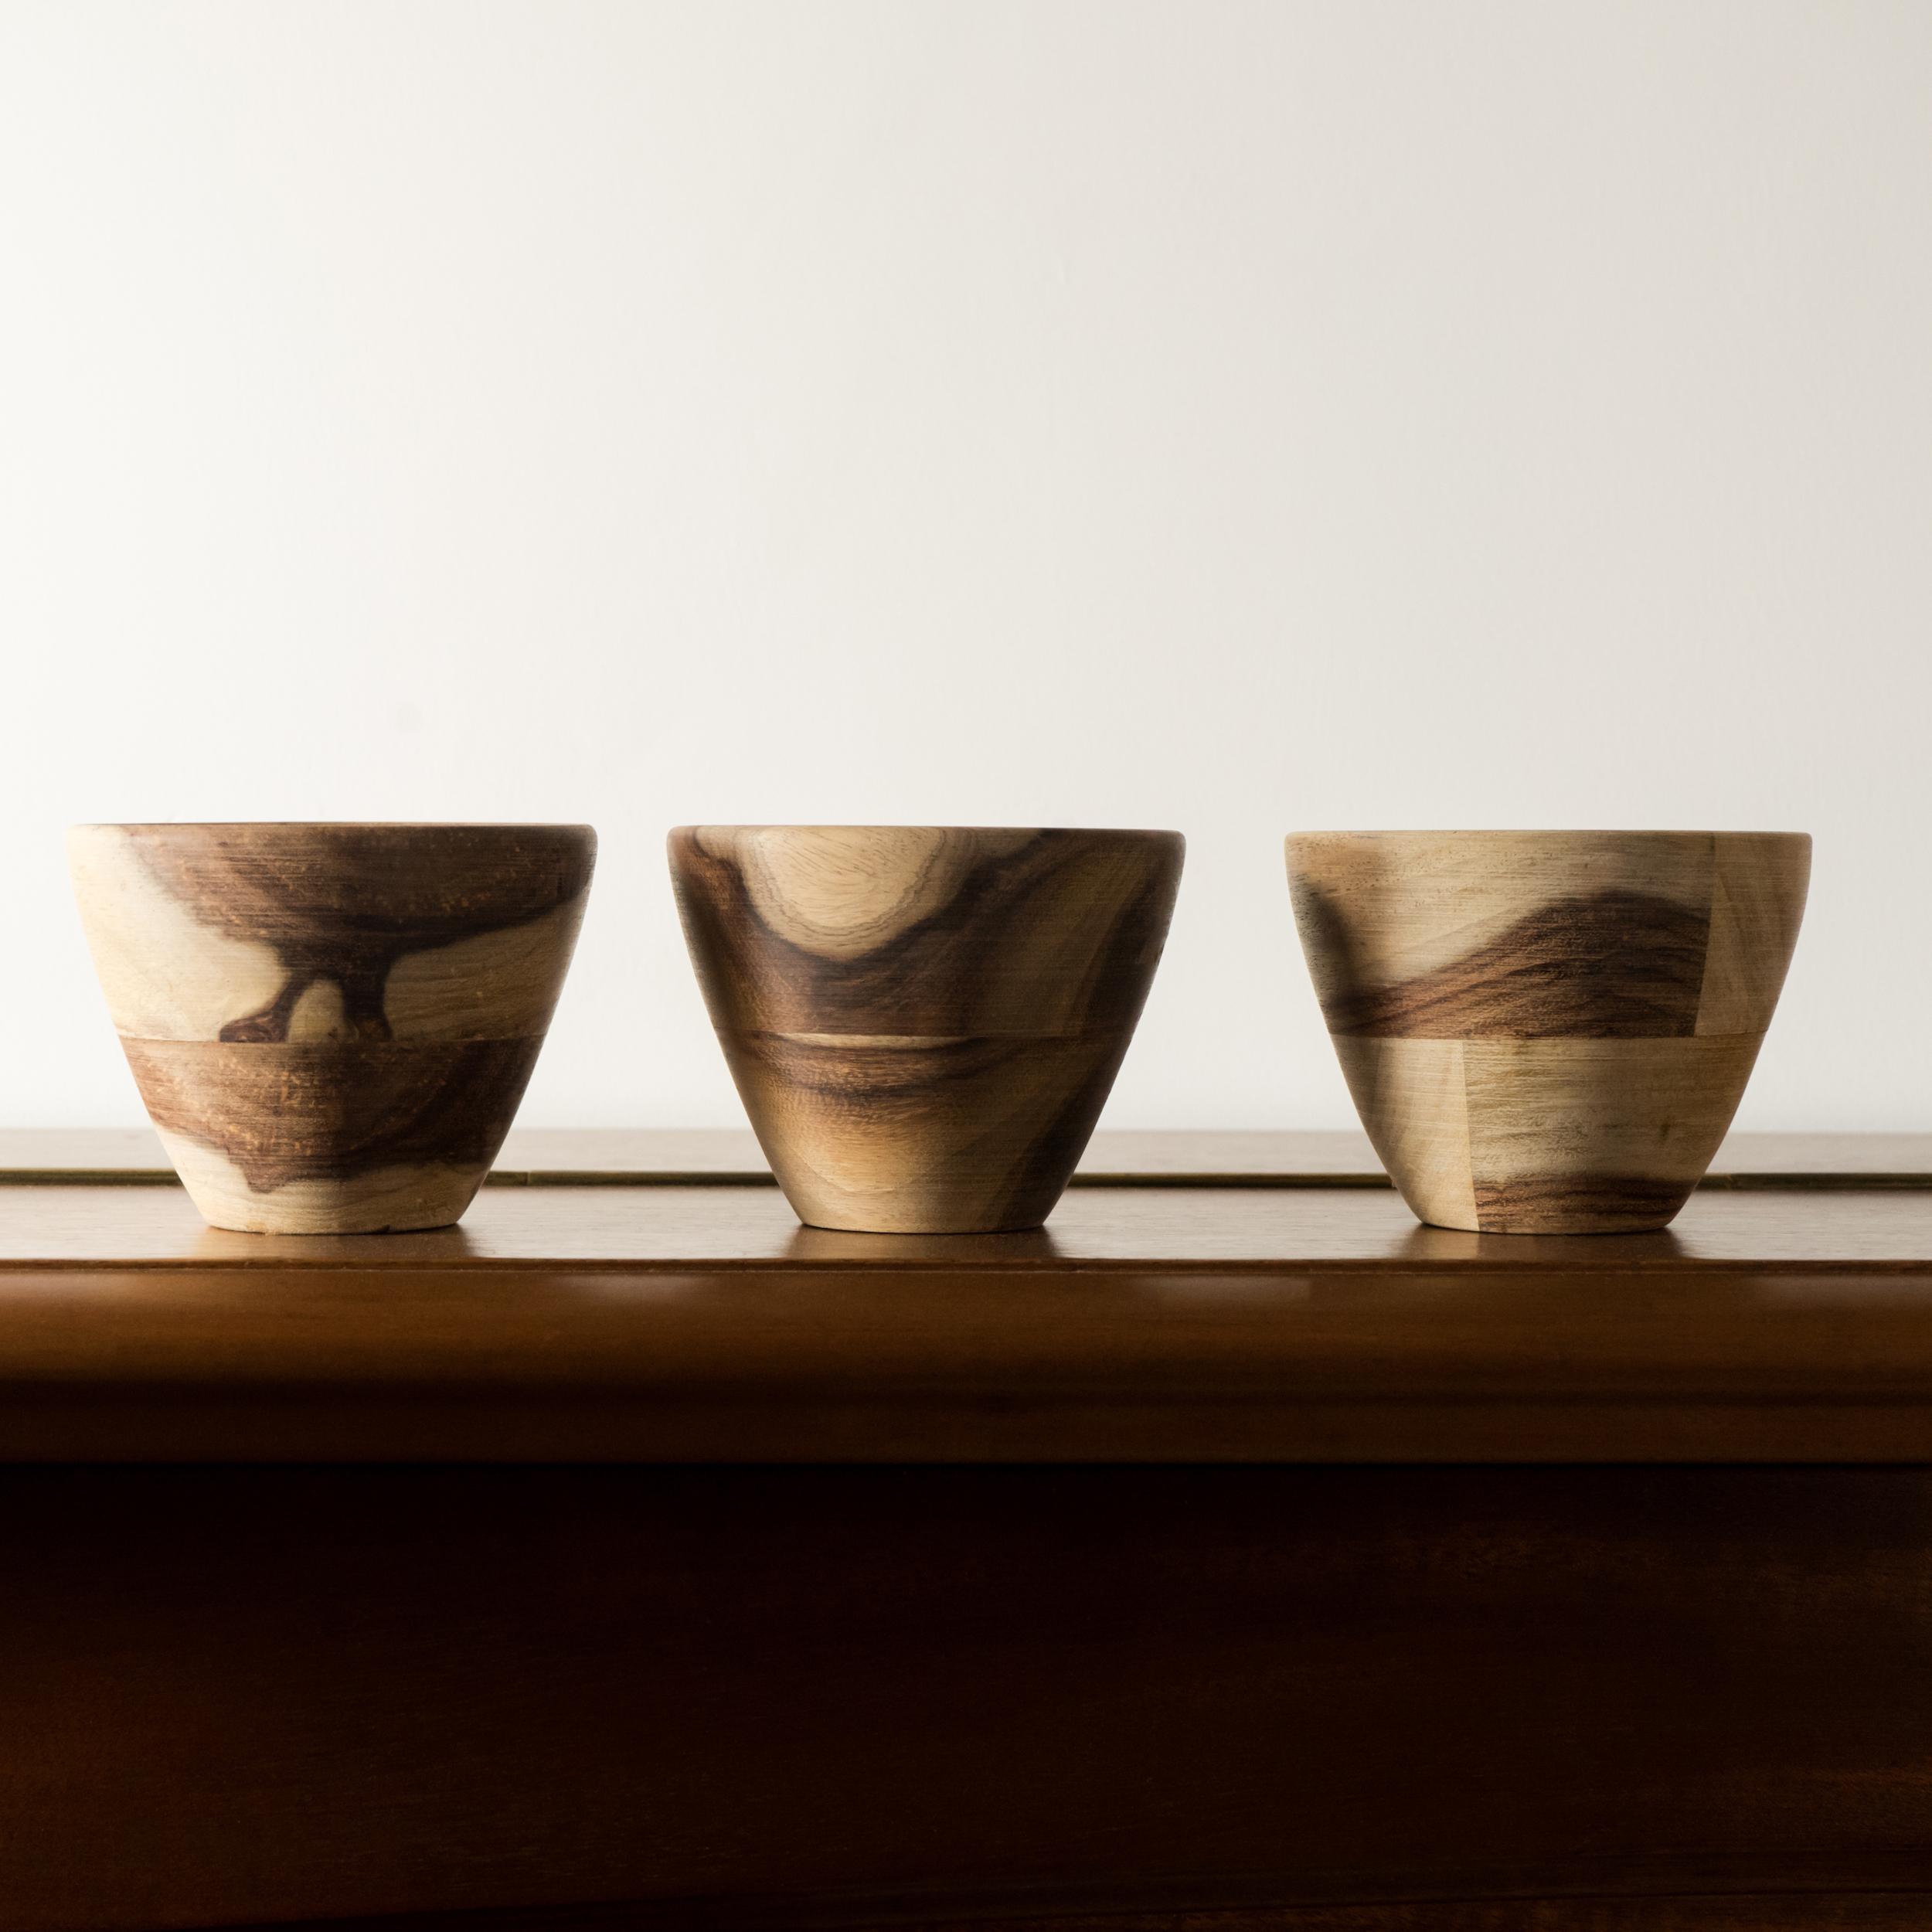 lavender and bone nkuku wooden bowls.jpg